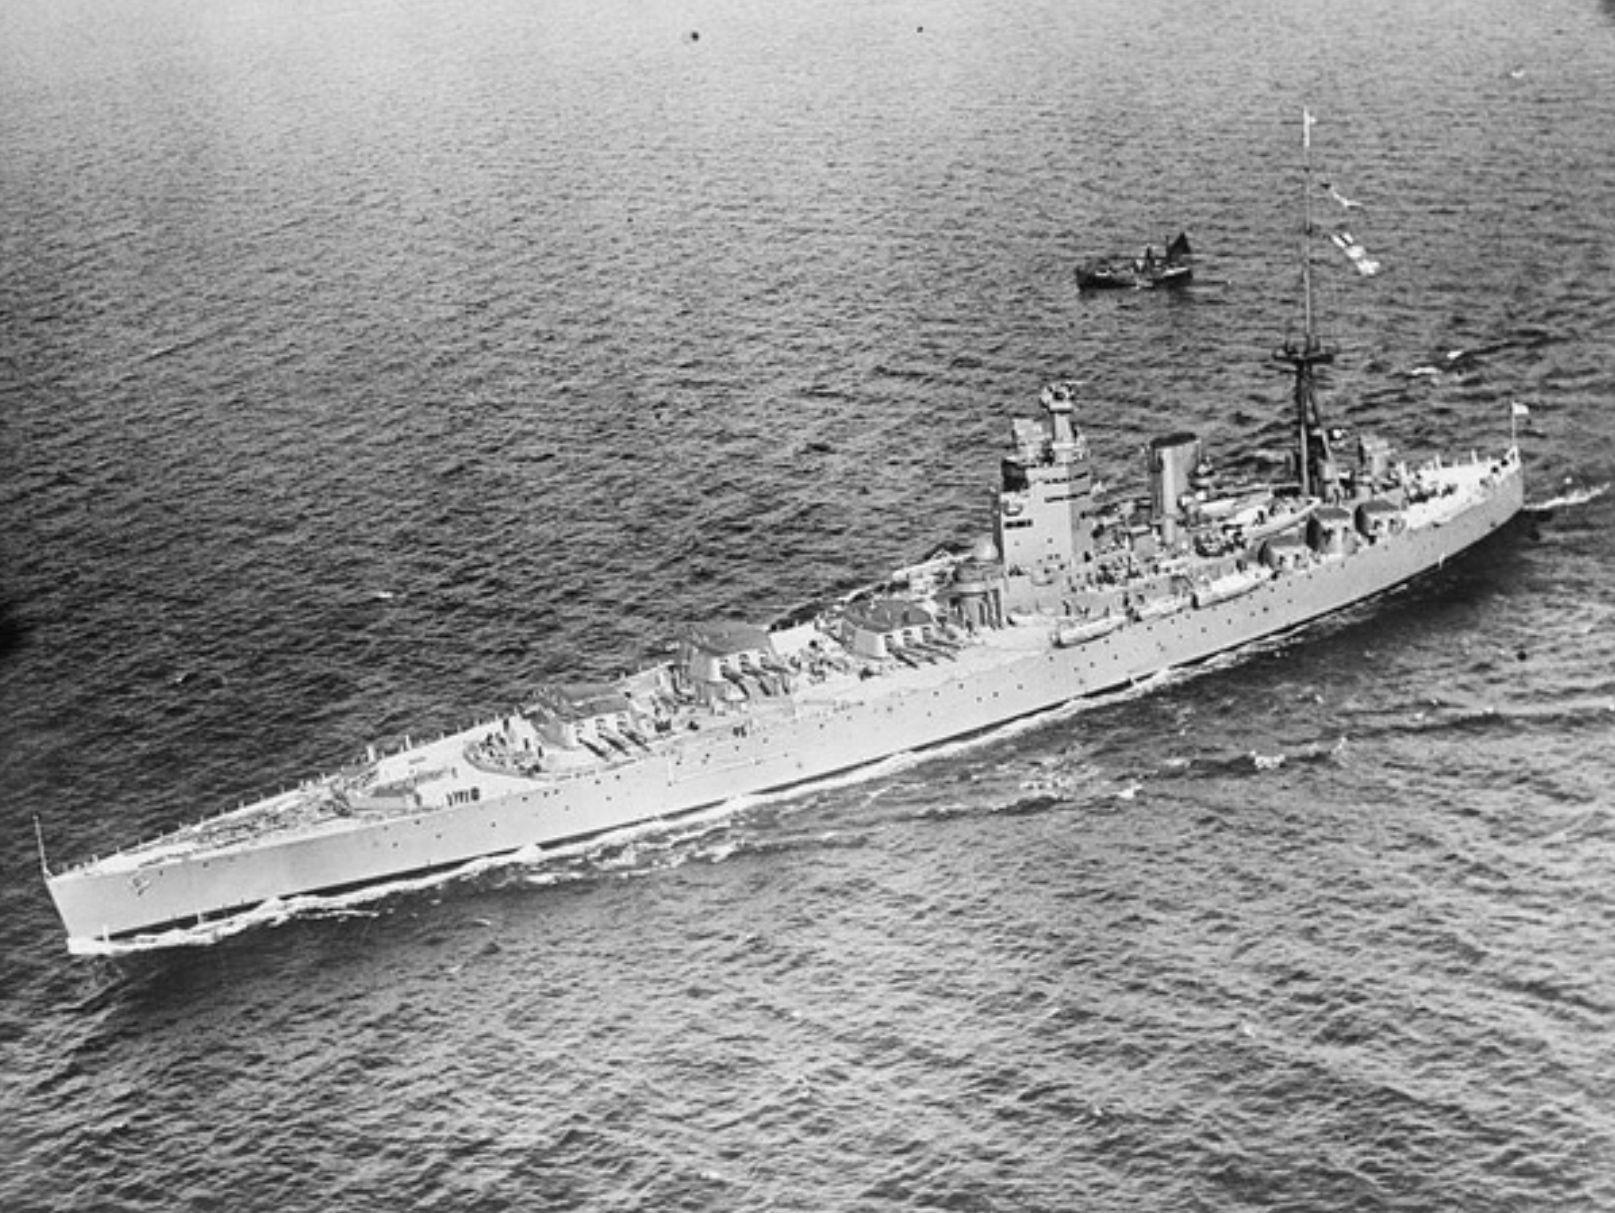 Pin By Lawsona On Battle Ships In 2020 Battleship Royal Navy Aircraft Carriers Royal Navy Ships